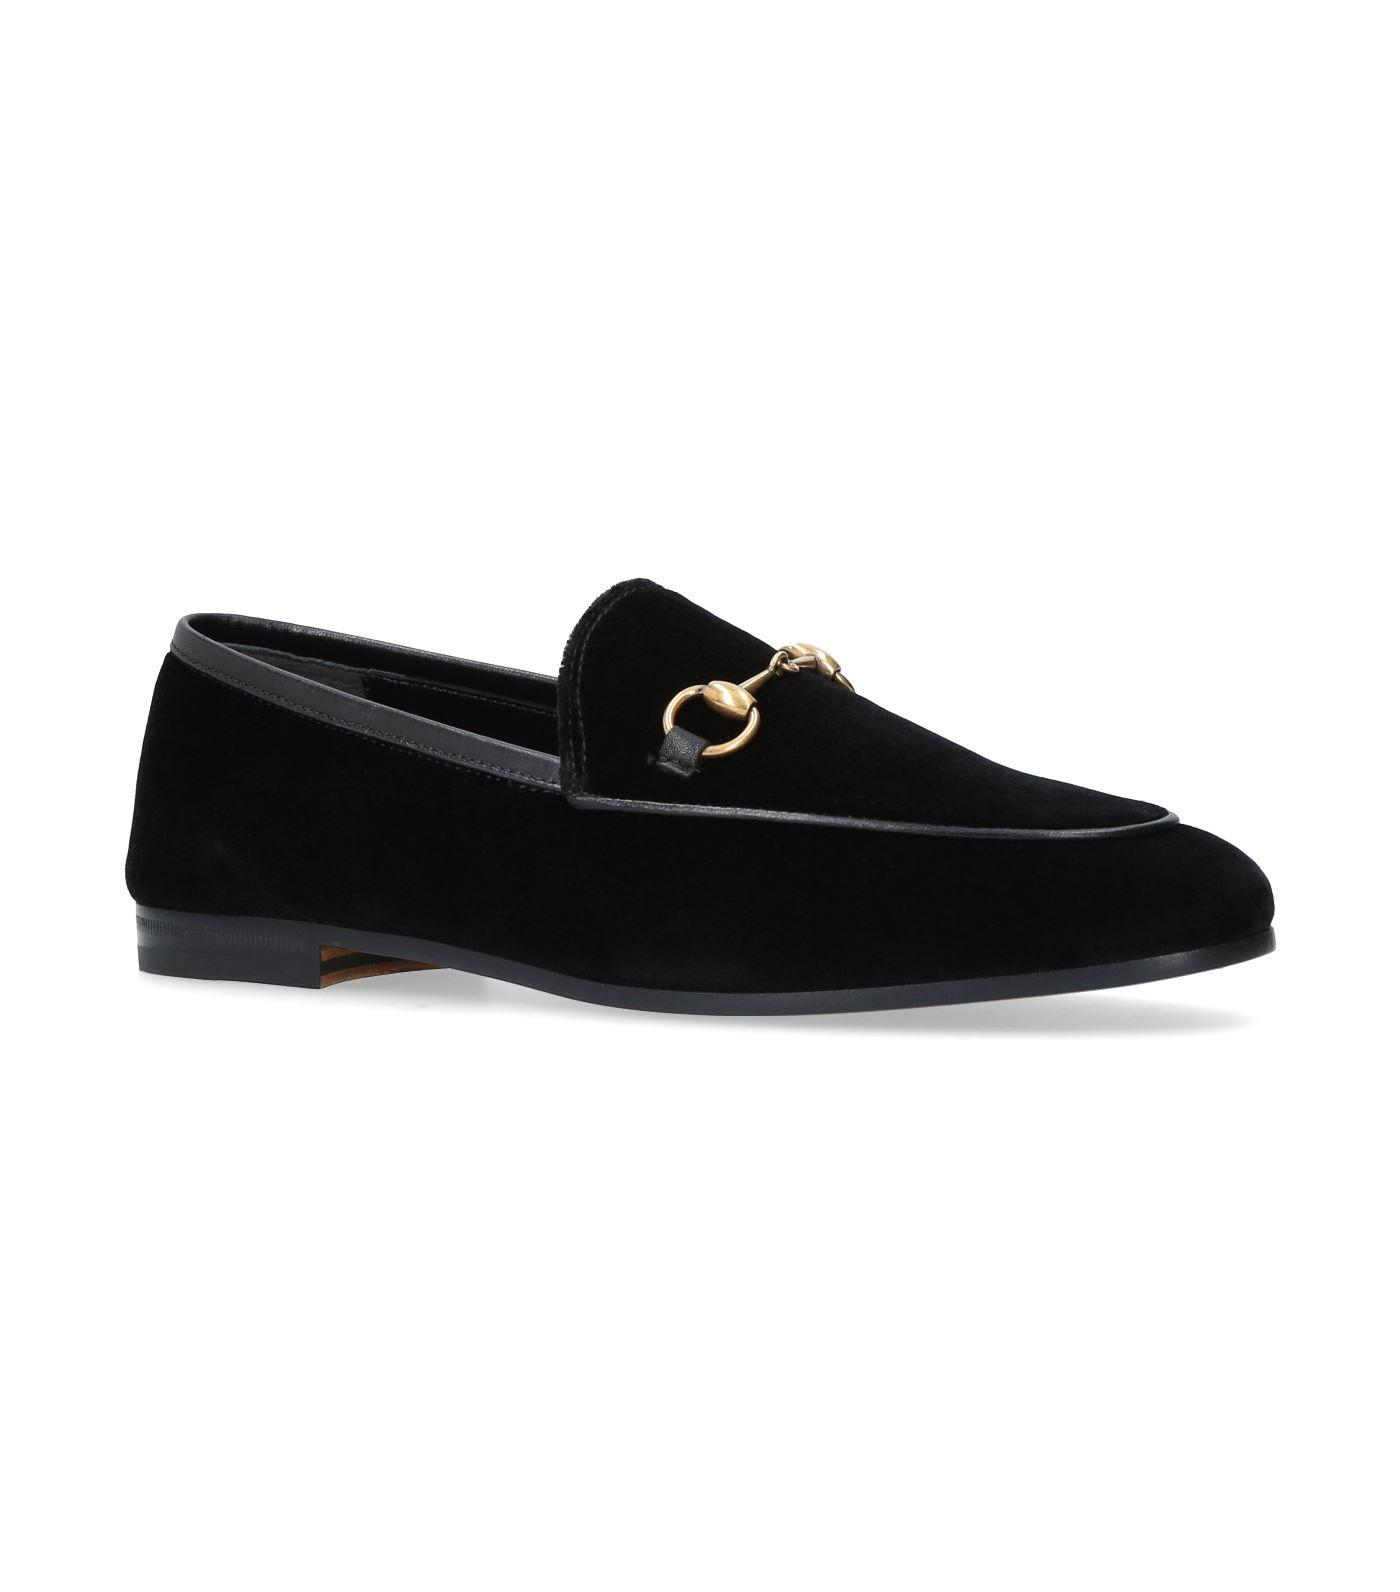 979aa699007 Gucci 10Mm New Jordaan Velvet Loafer In Black